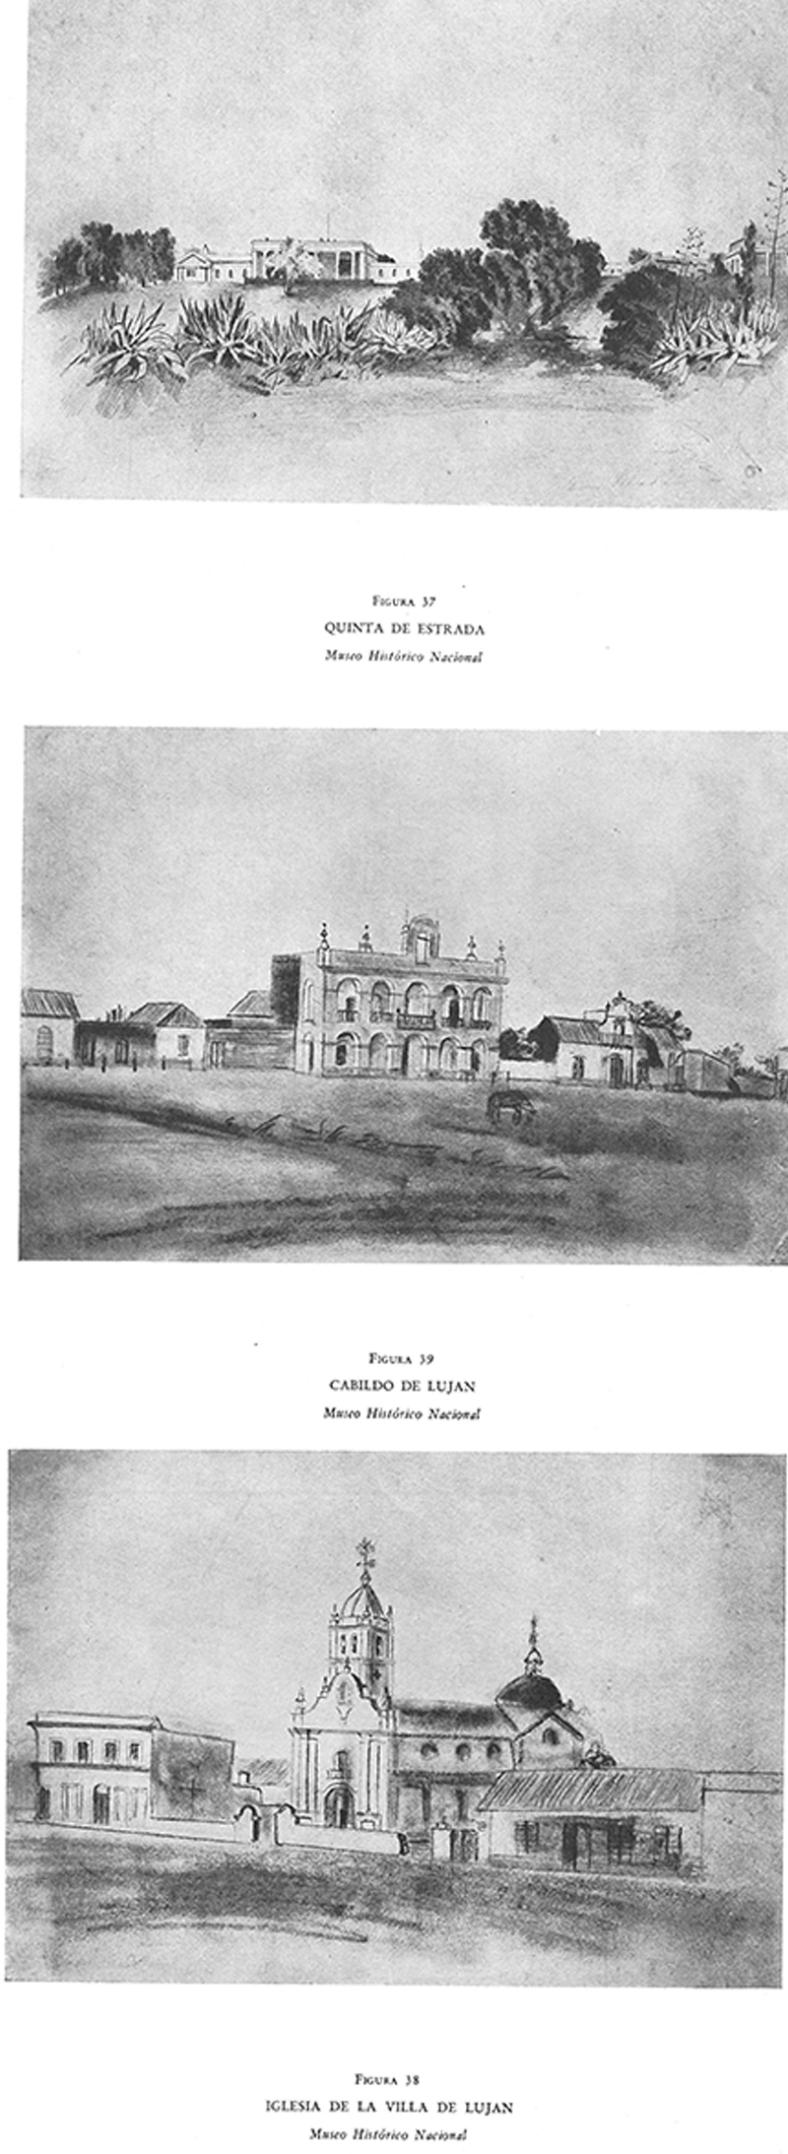 Quinta de Estrada / Cabildo de Lujan / Iglesia de la Villa de Lujan